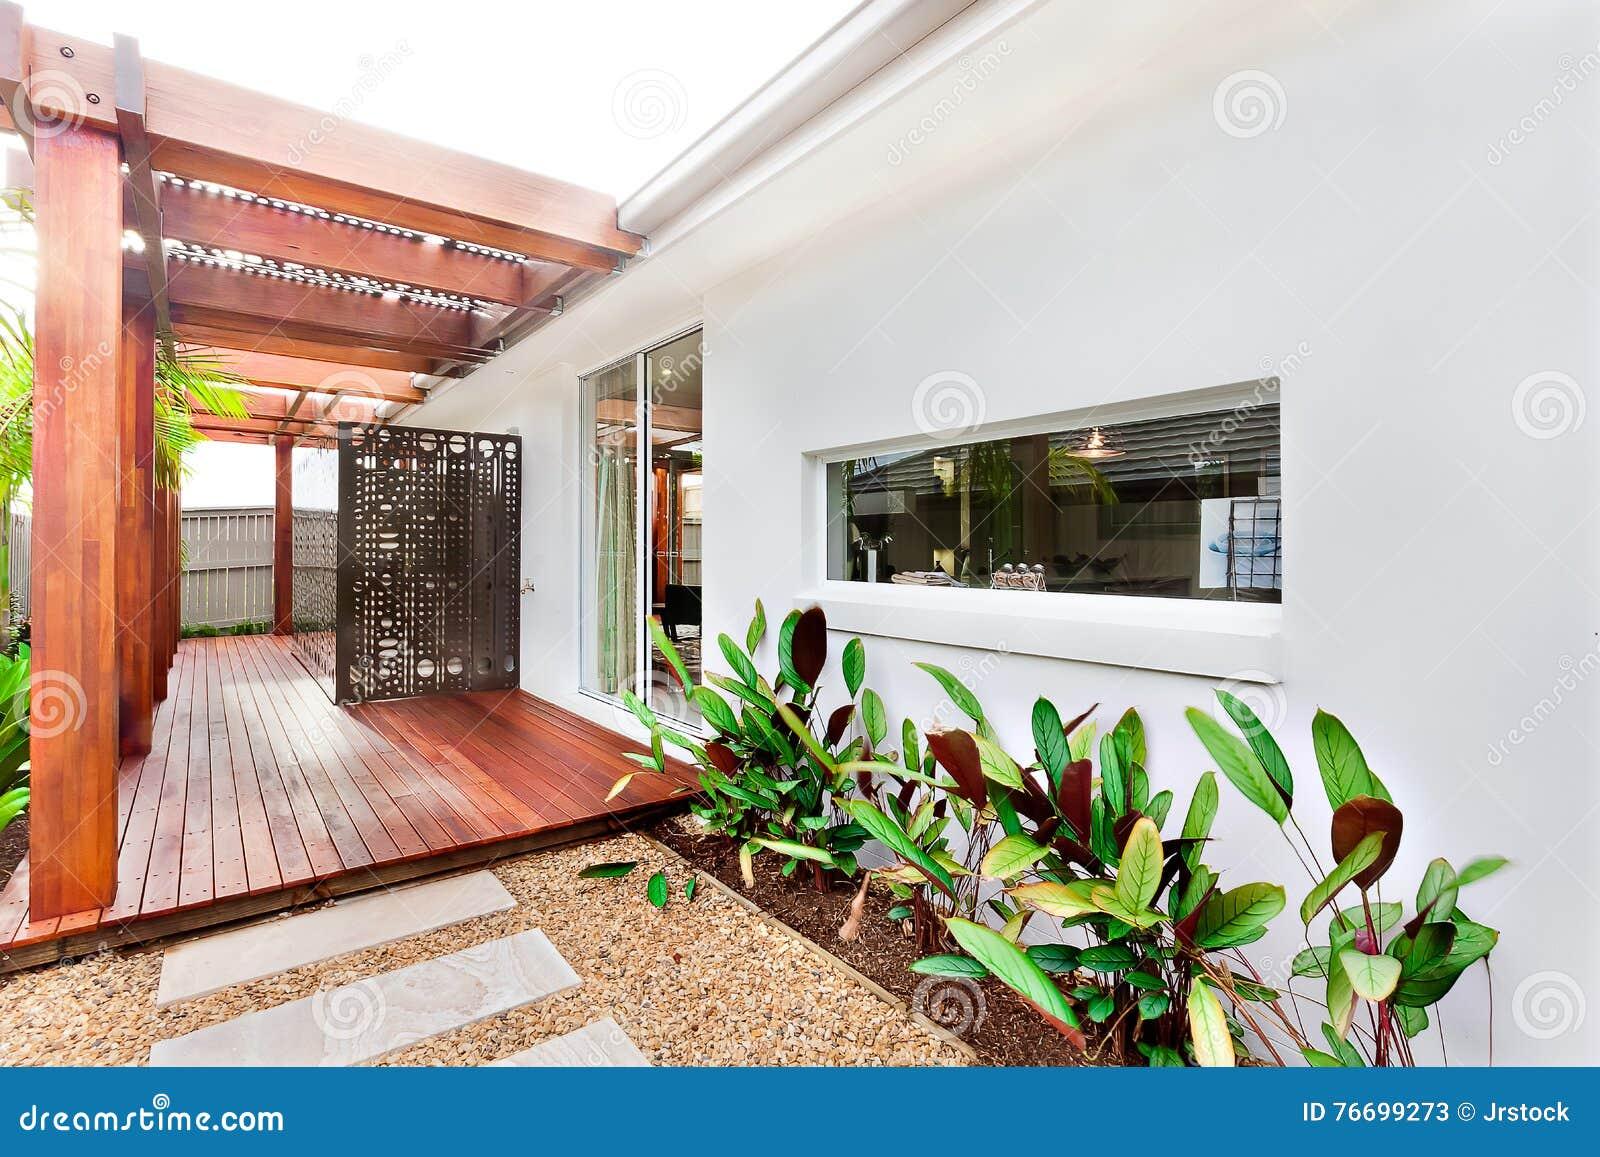 Entrada o fachada fuera de una casa moderna con madera enorme imagen de archivo imagen de - Entrada de casas modernas ...